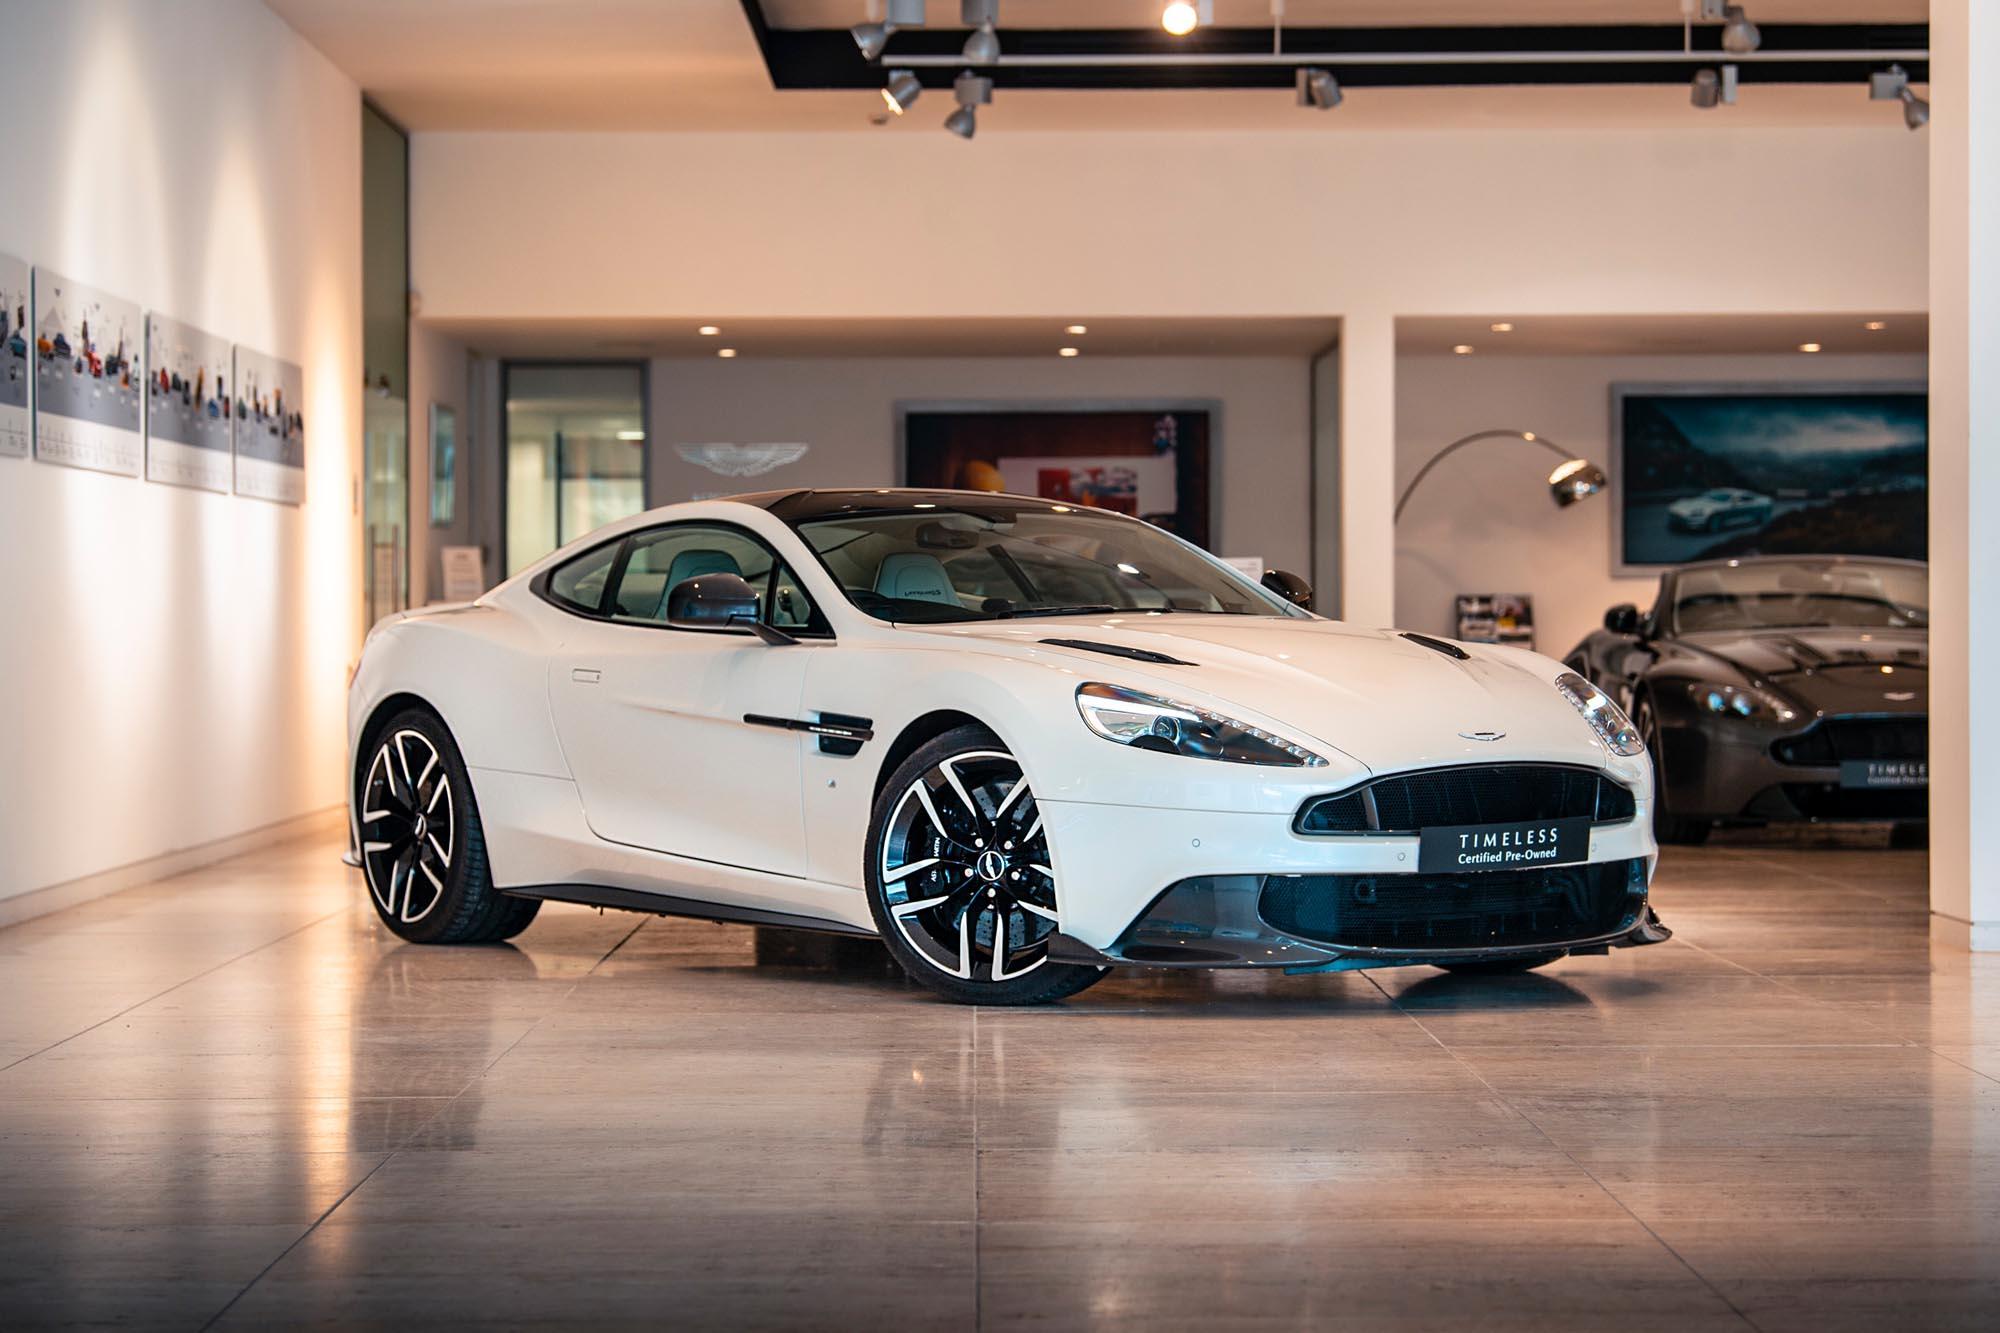 Aston Martin Vanquish S Car Photography